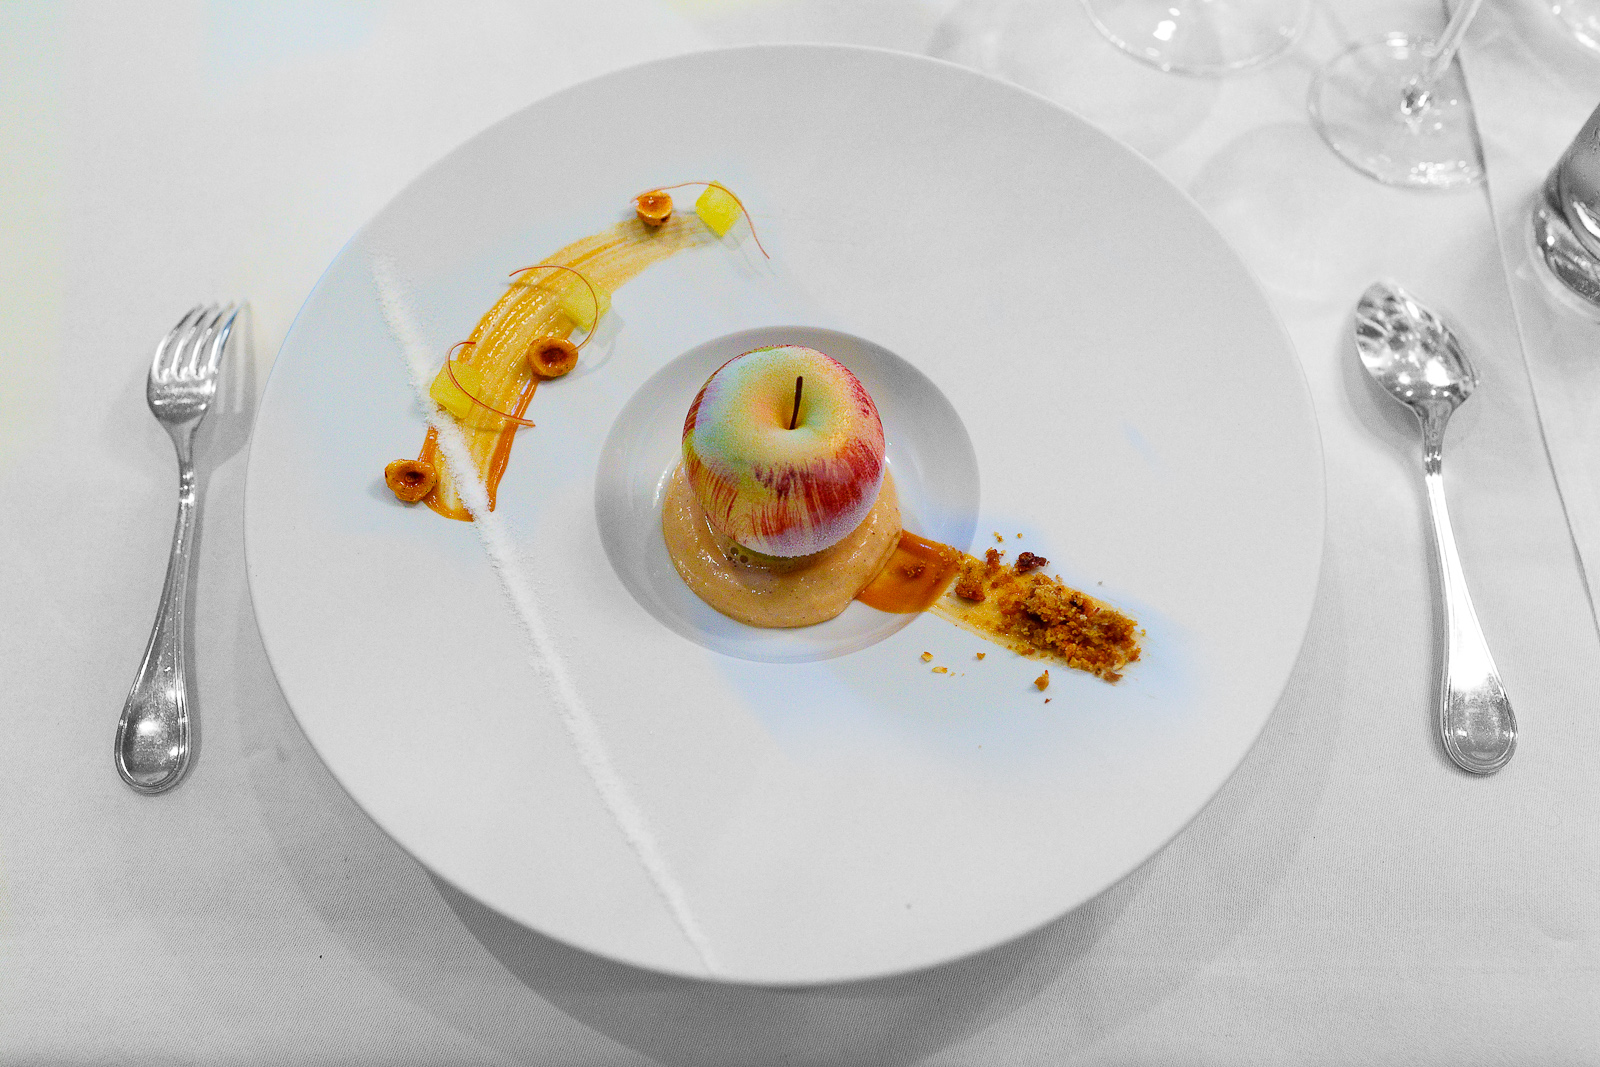 6th Course: Gravensteiner apple, warm - cold - ice cold, hazelnut cookies, yoghurt, and powder